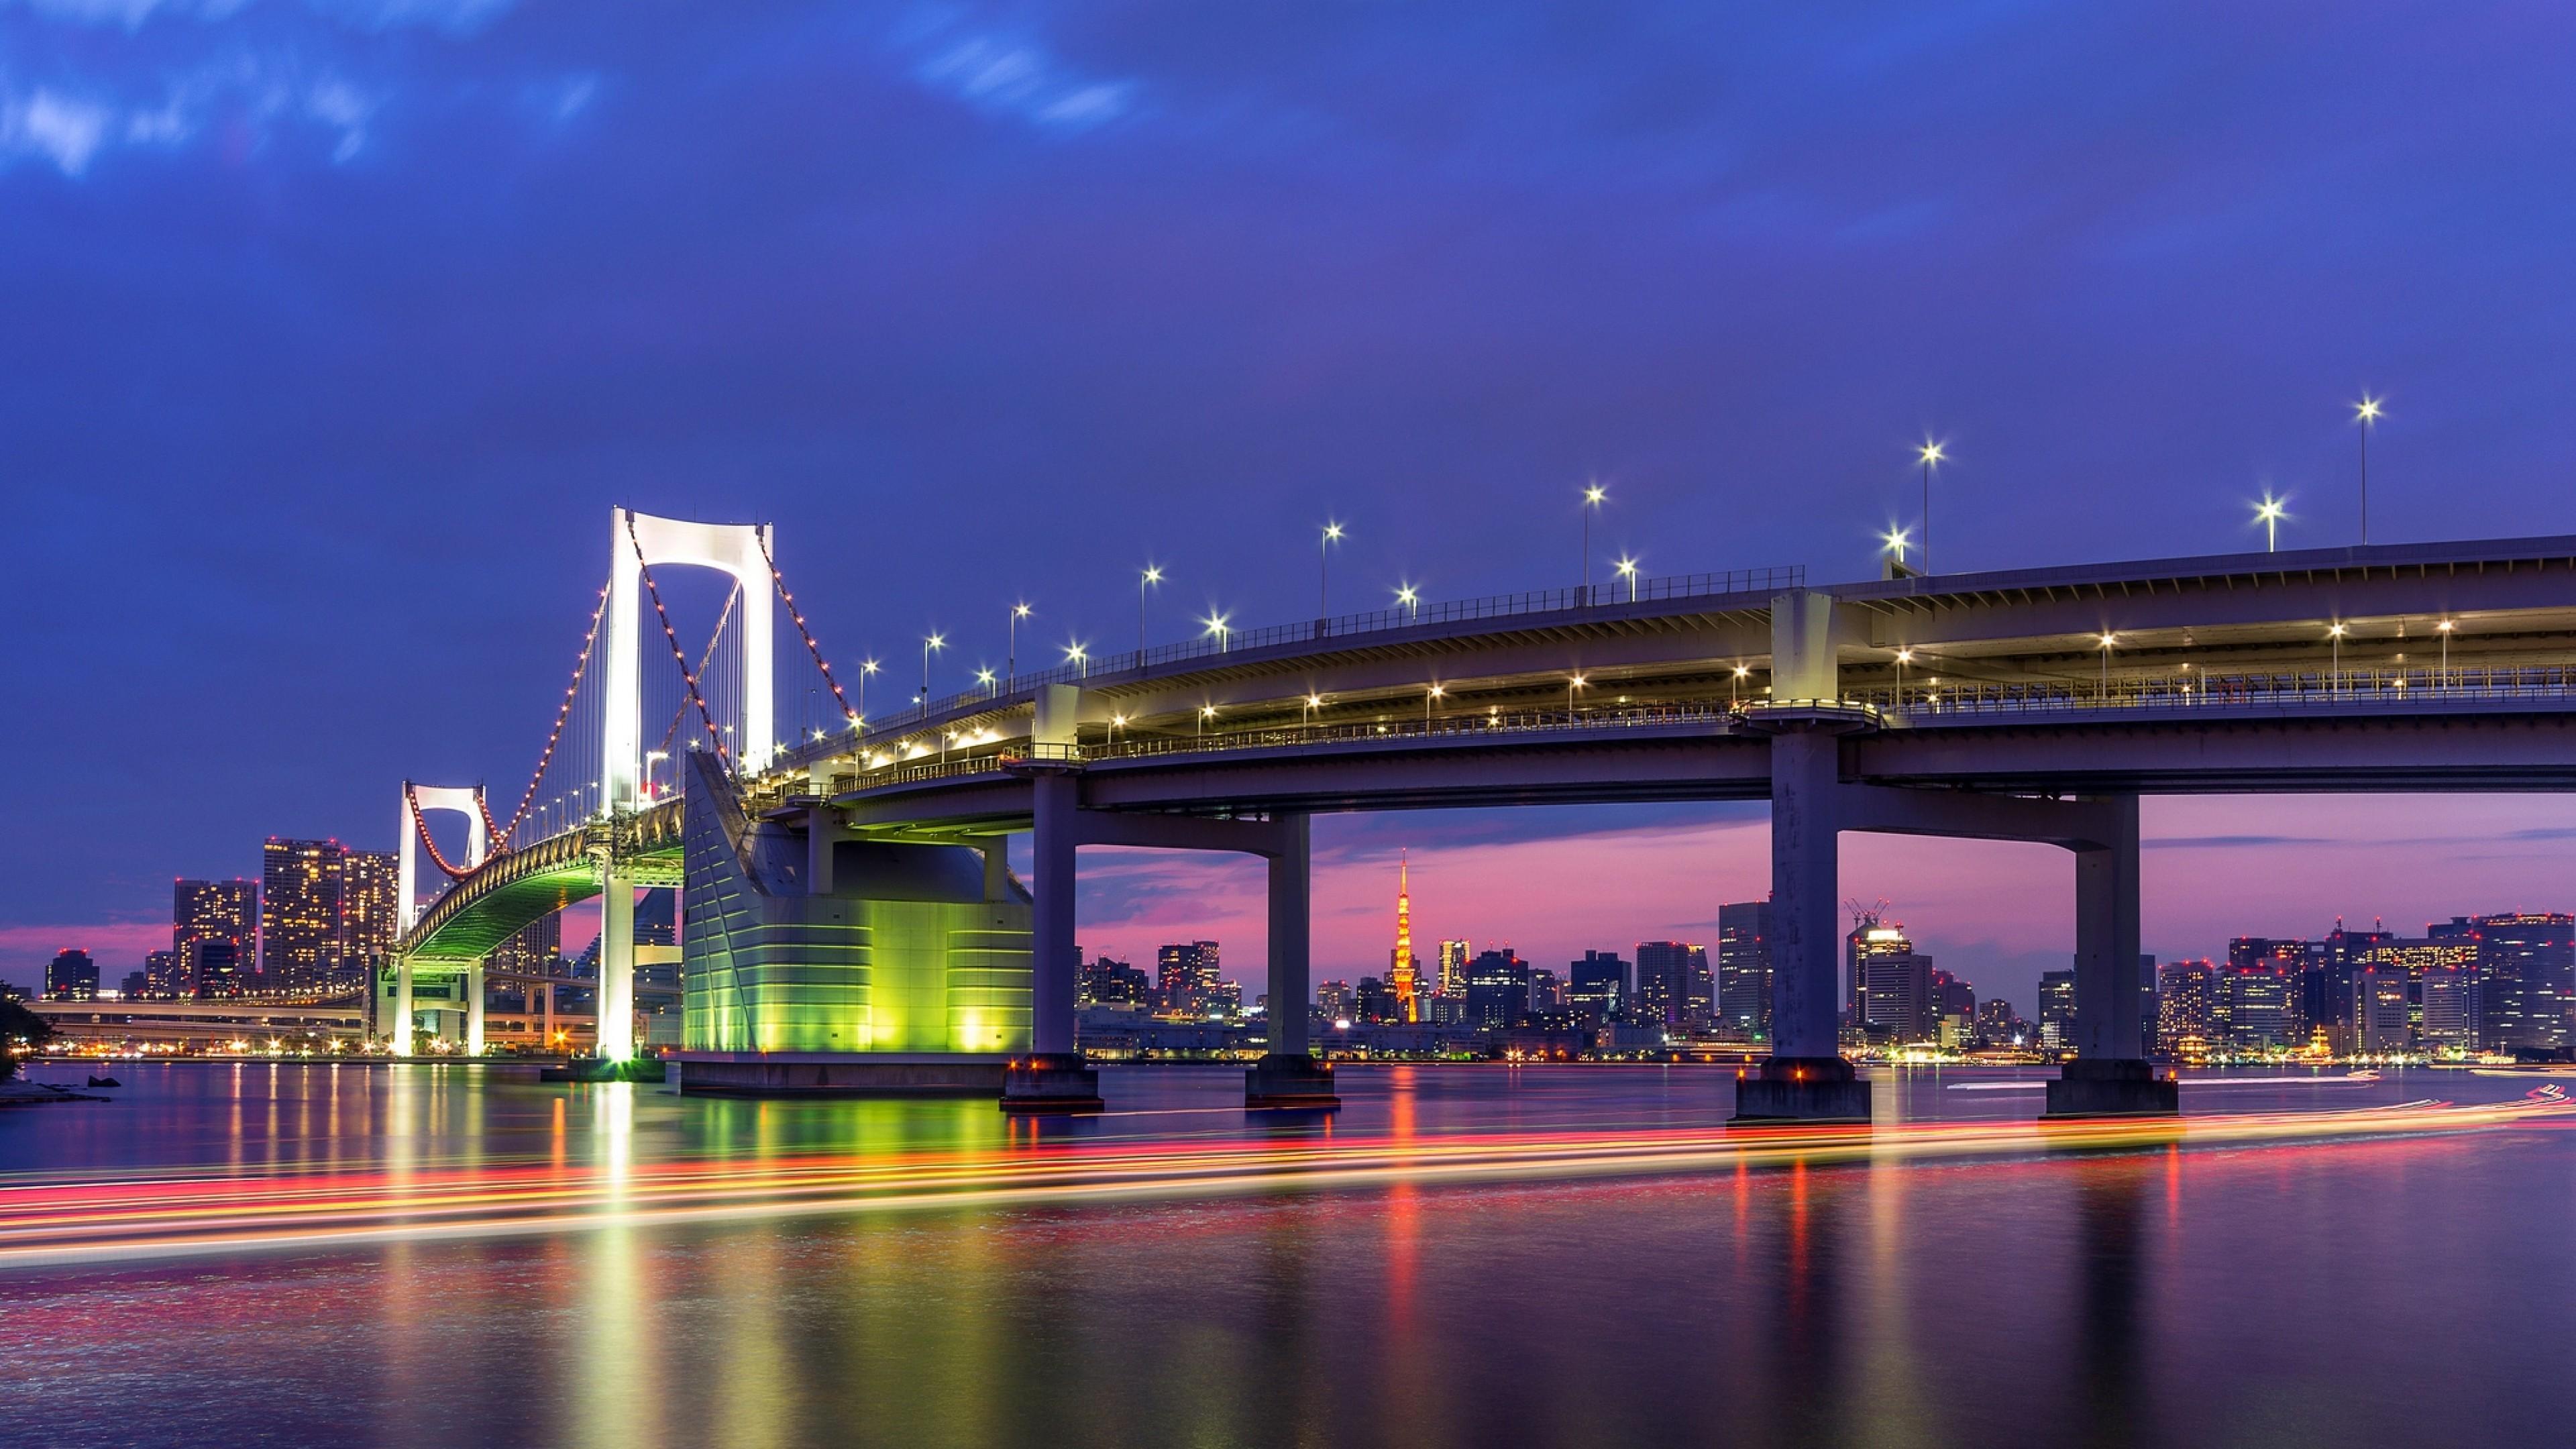 Preview wallpaper tokyo, capital city, metropolis, bridge, lights,  lighting, shutter